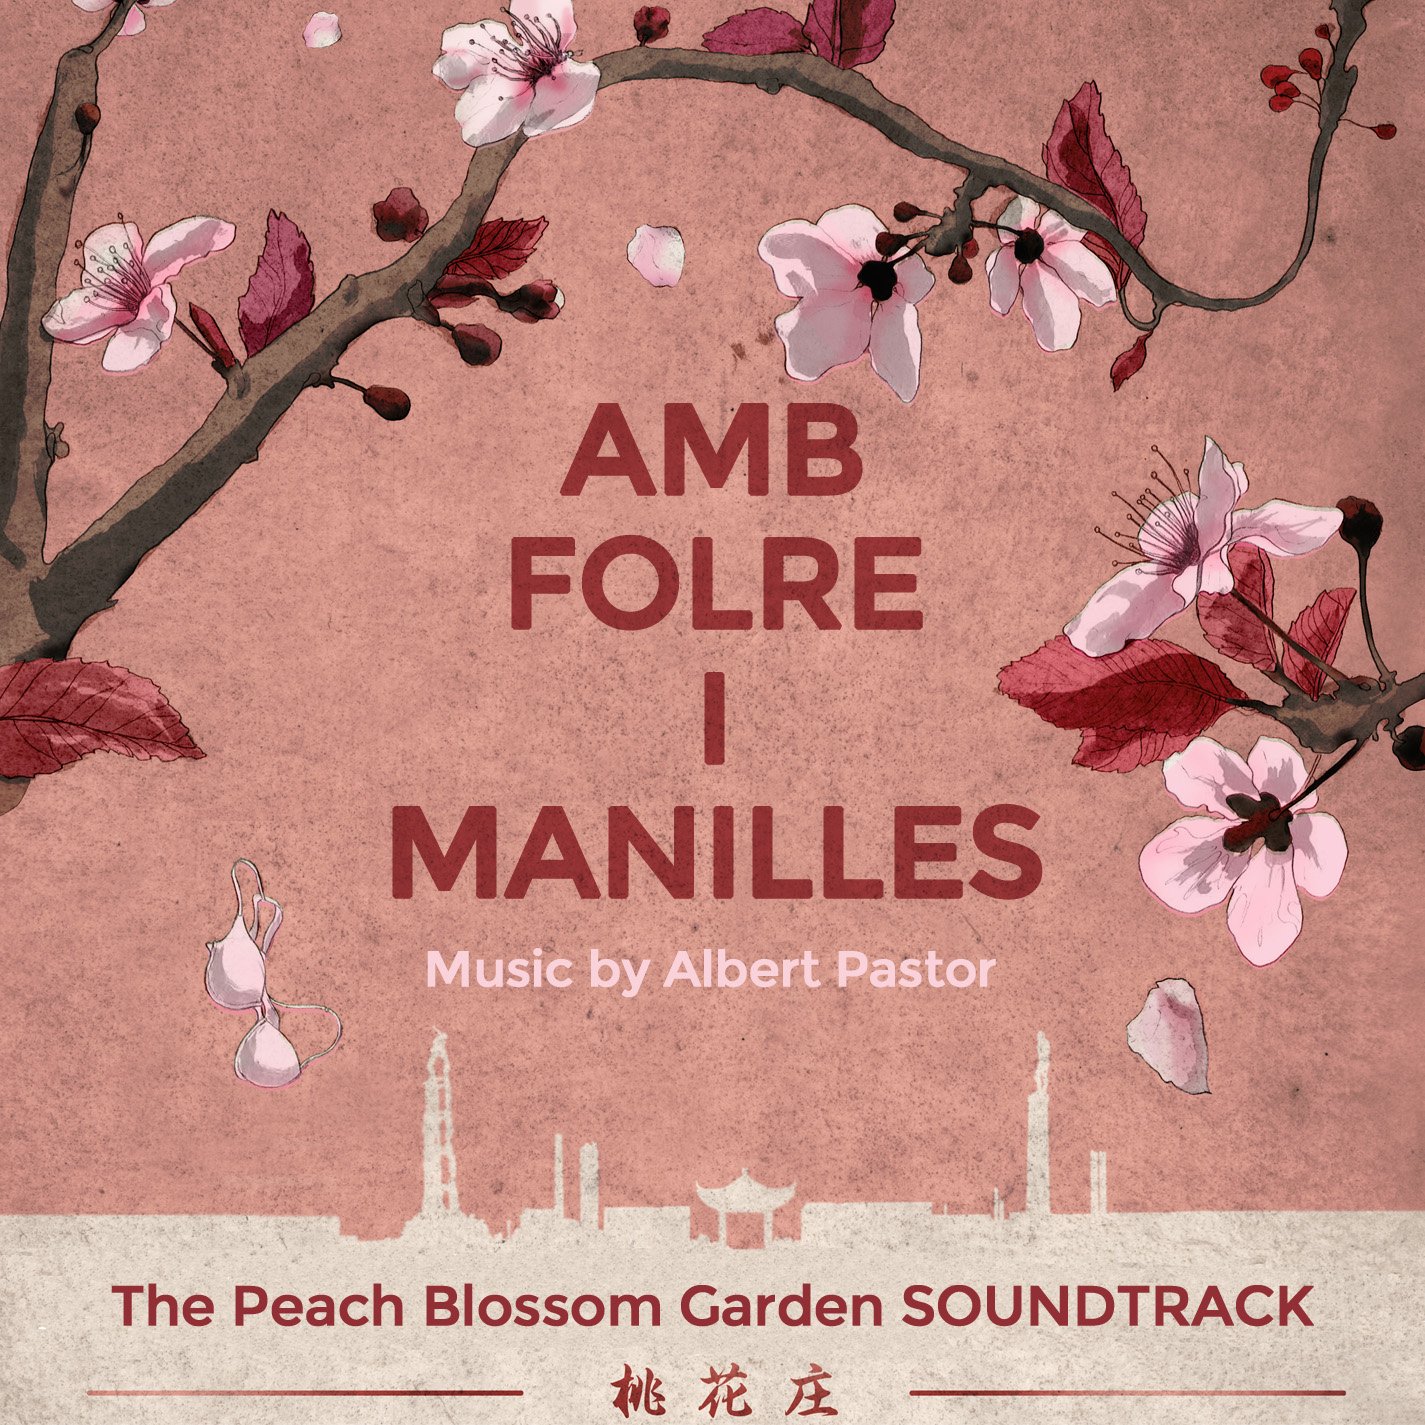 Albert Pastor Folre i Manilles Soundtrack Peach Blossom Garden